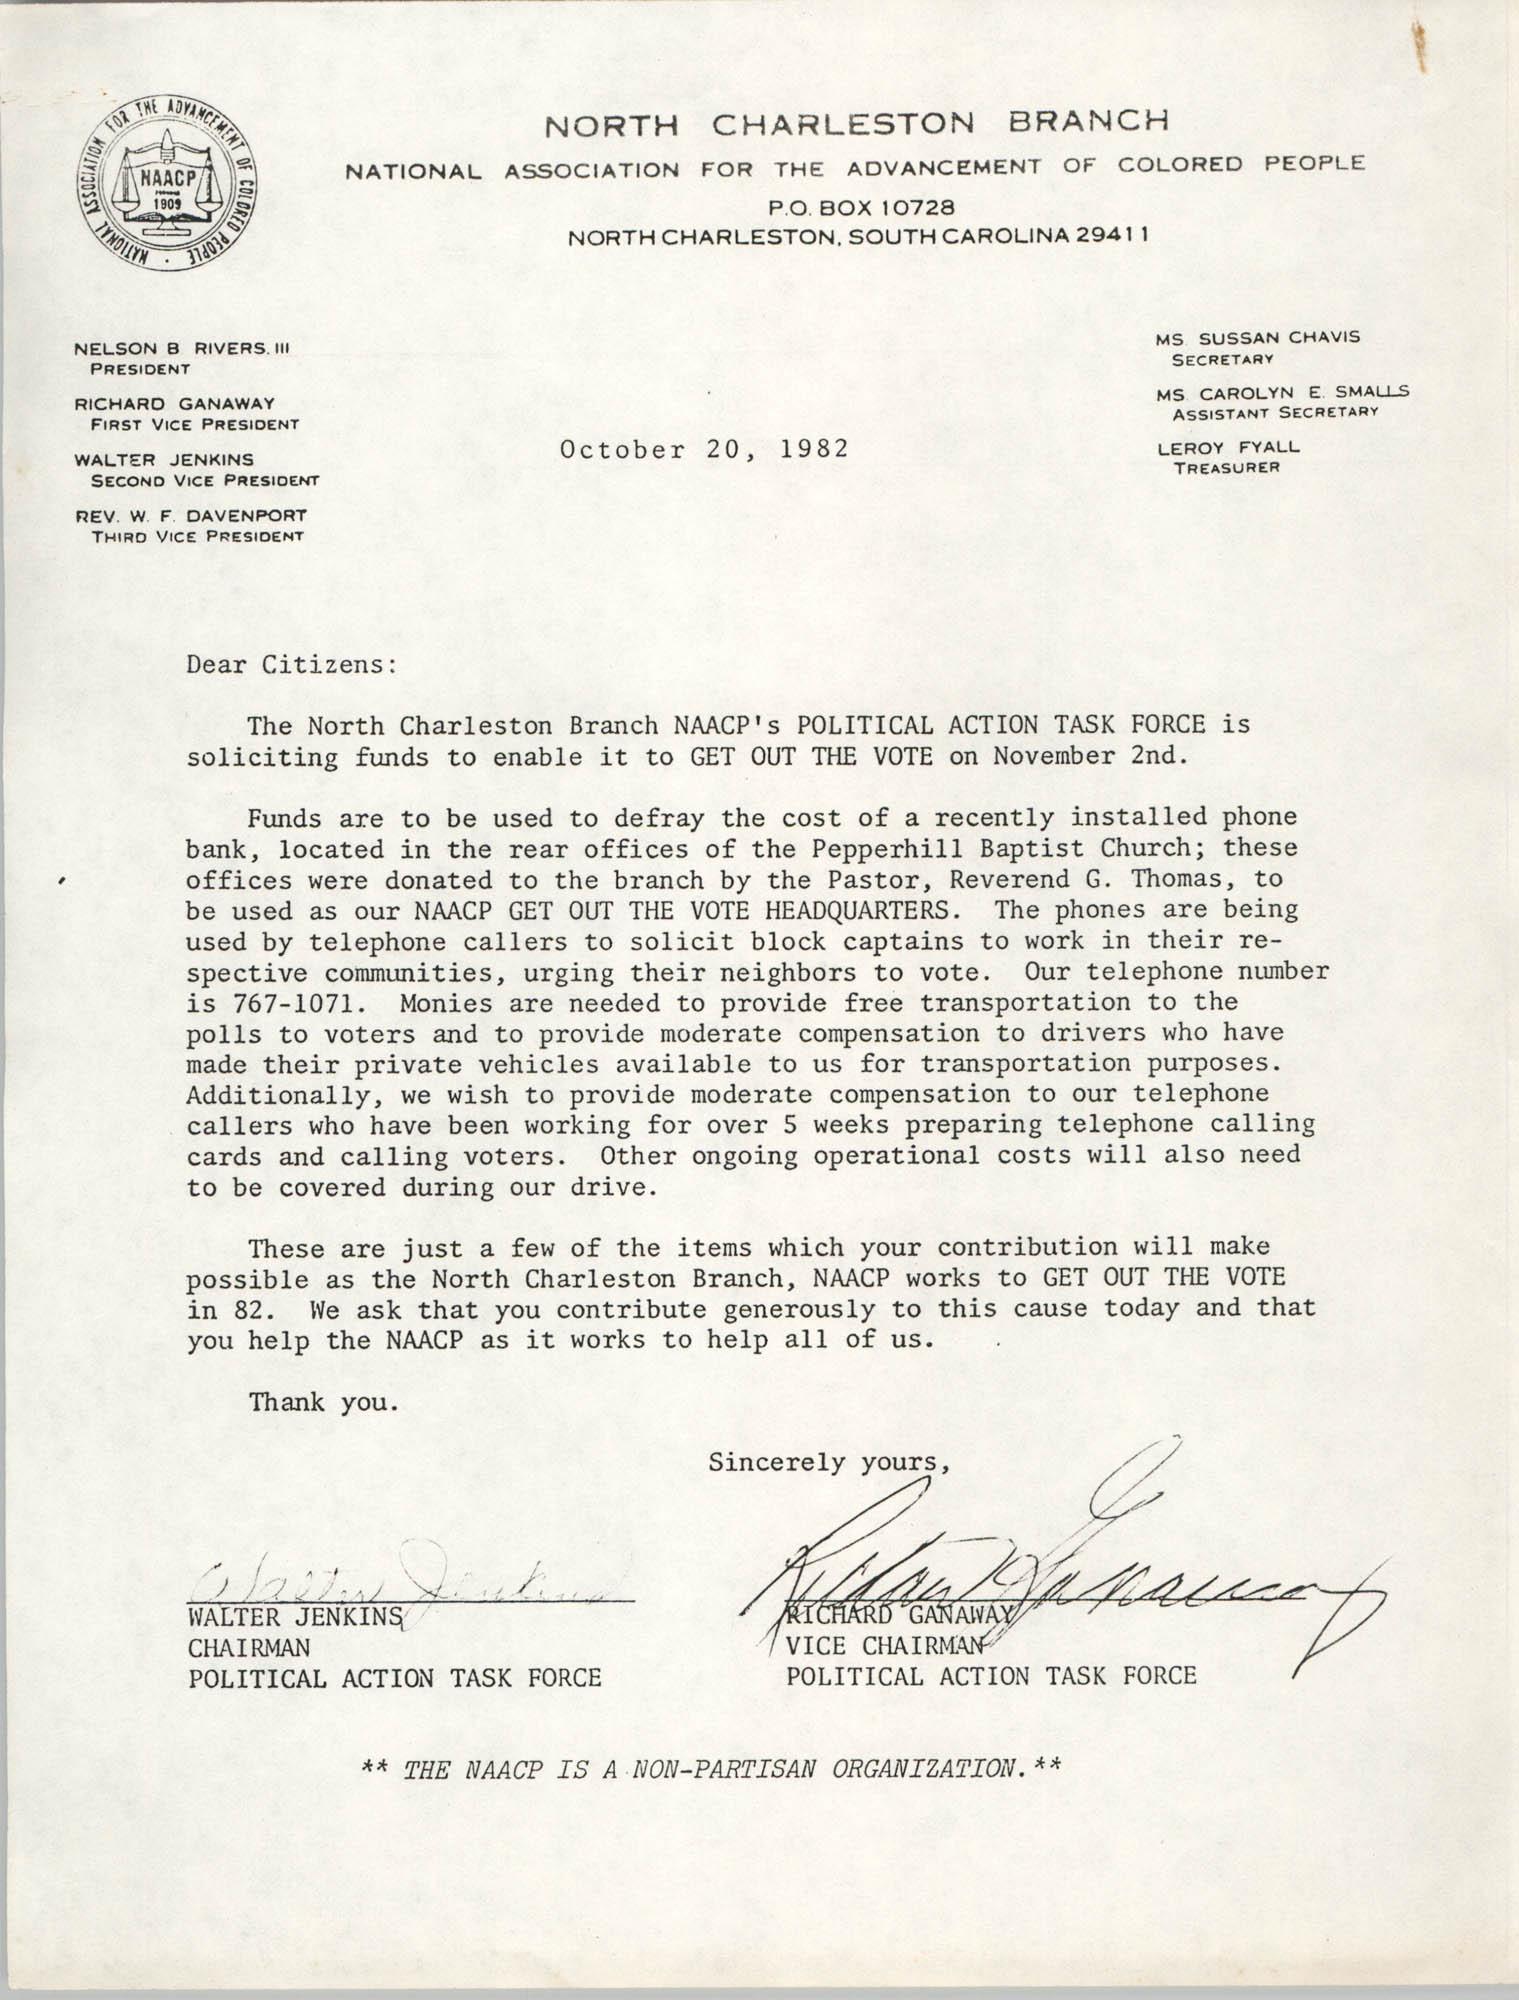 North Charleston Branch of the NAACP Memorandum, October 20, 1982